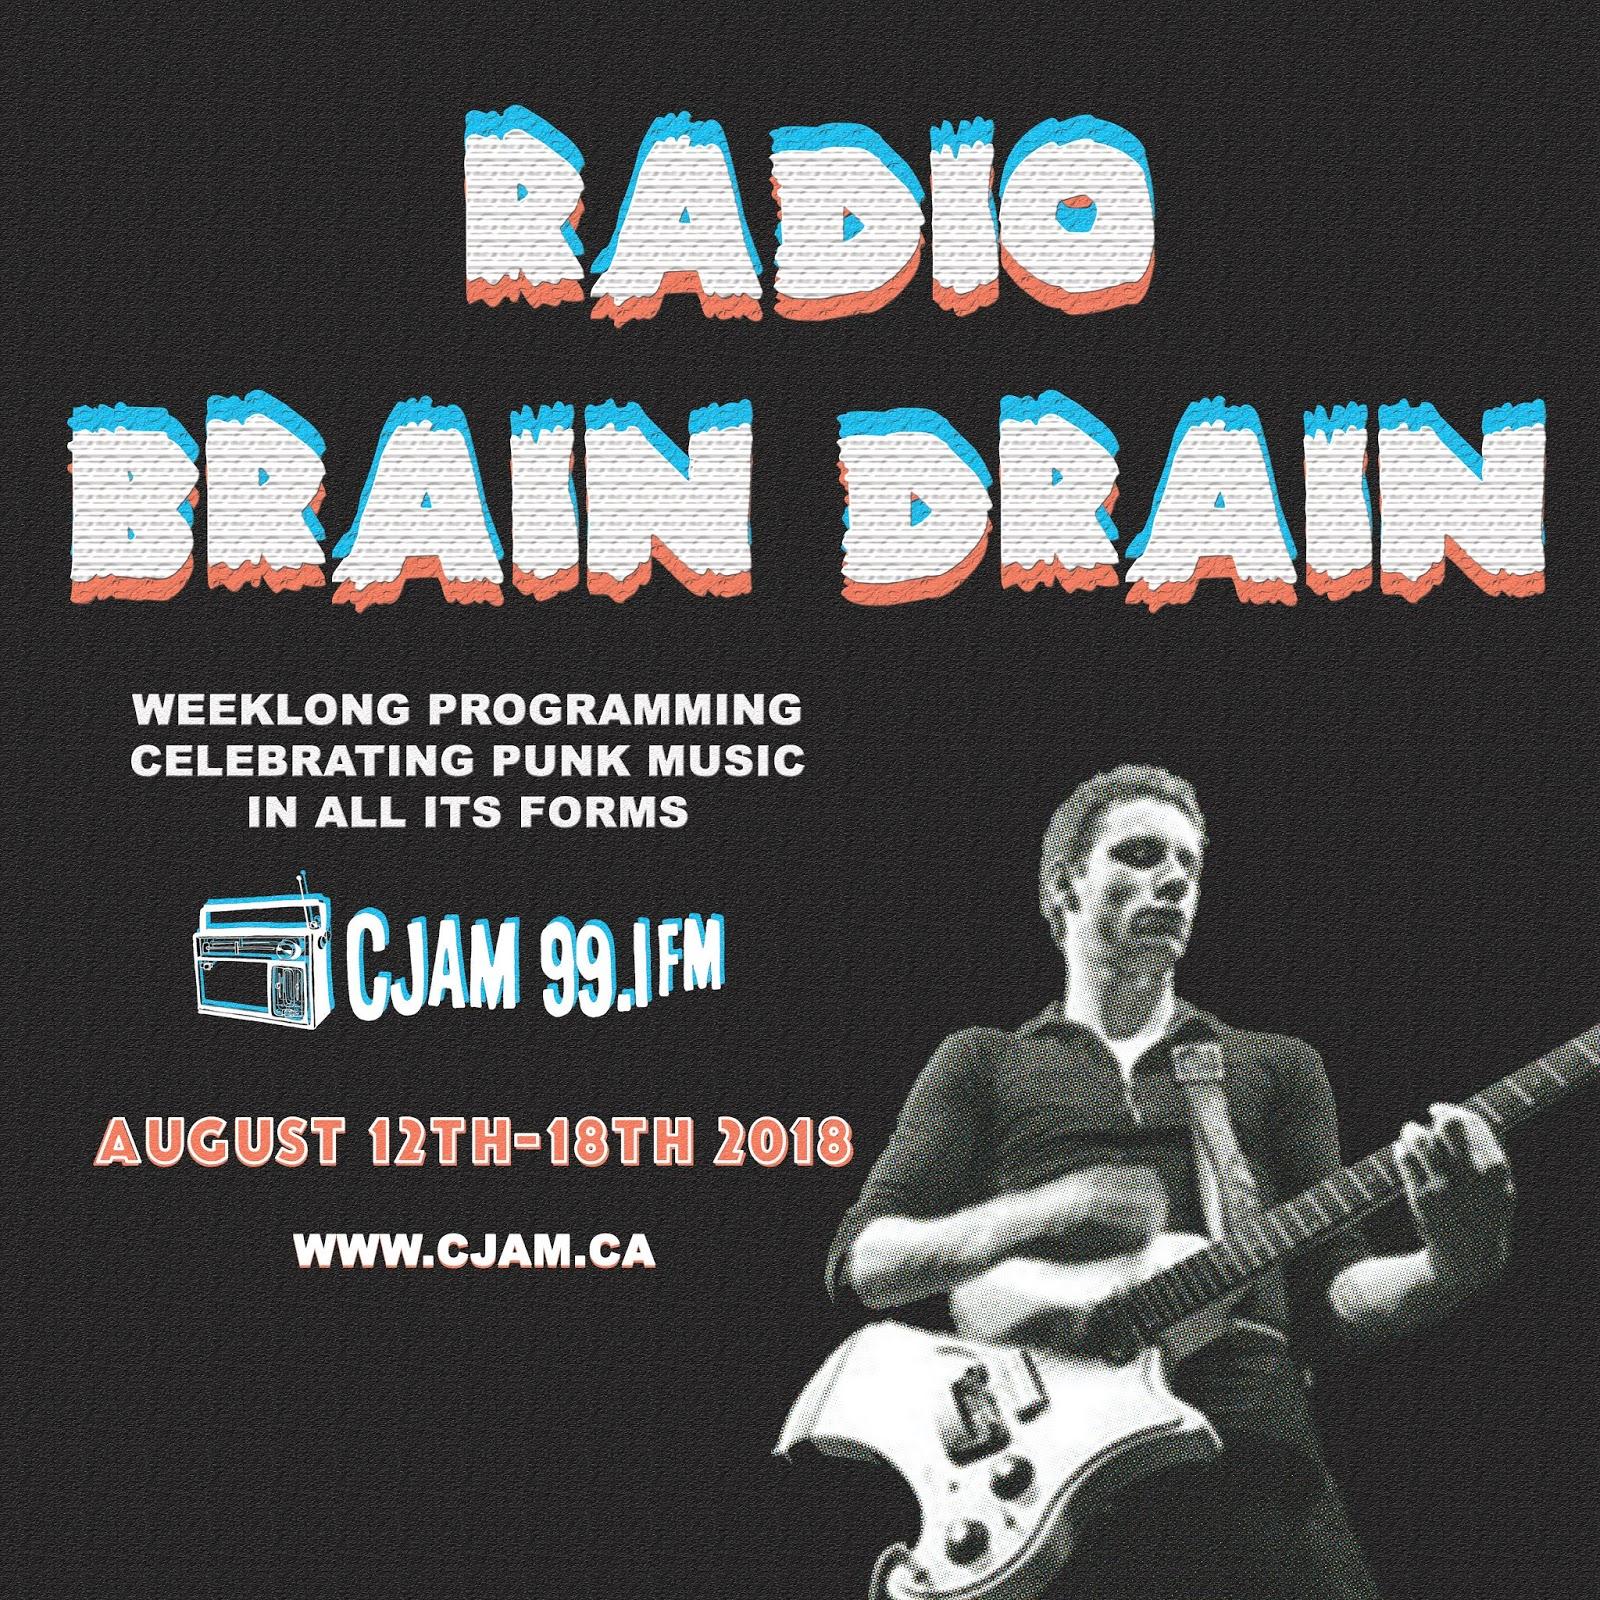 Revolution Rock: Radio Brain Drain: An Interview With Colin Newman ...